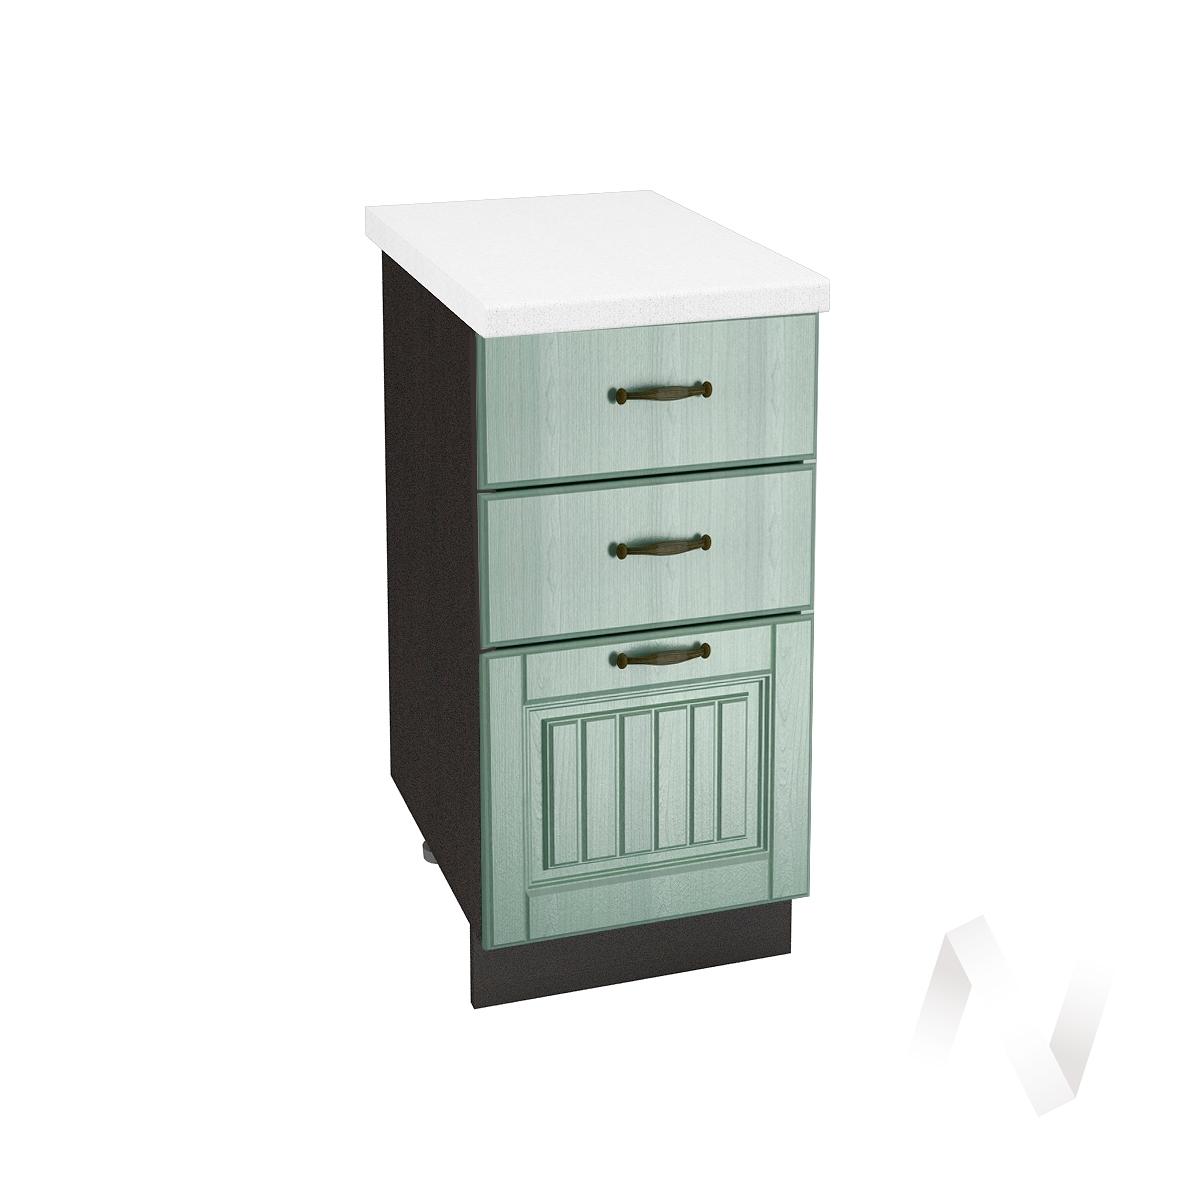 "Кухня ""Прованс"": Шкаф нижний с 3-мя ящиками 400, ШН3Я 400 (корпус венге)"